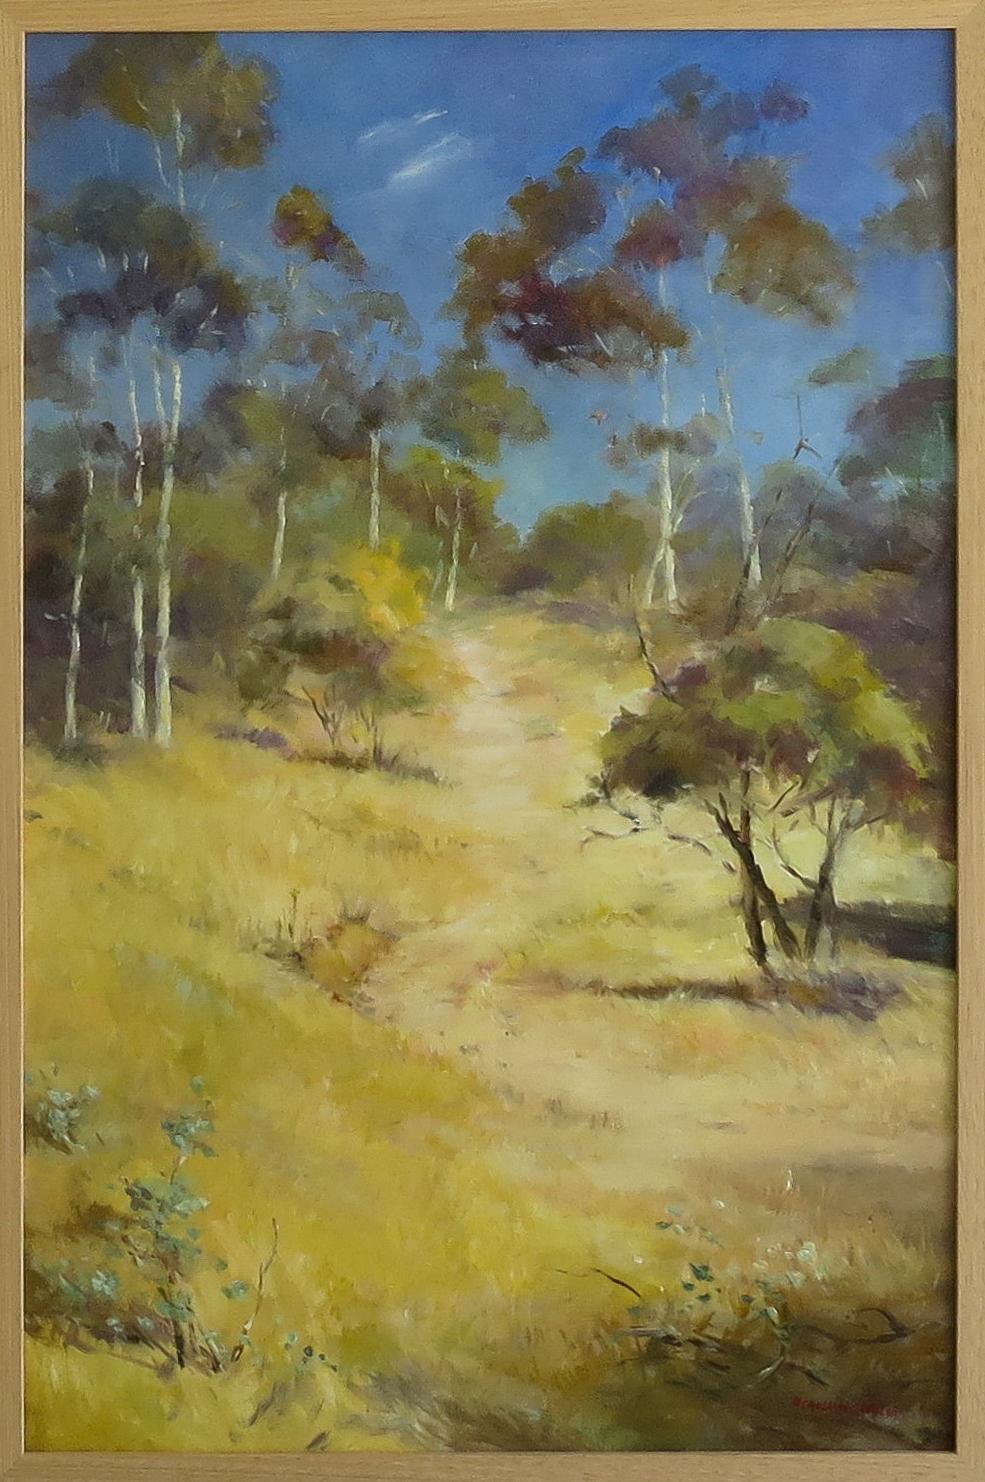 Jacqueline FowlerBrilliant Day, 2018 Oil on Canvas87 x 58 cm.jpg